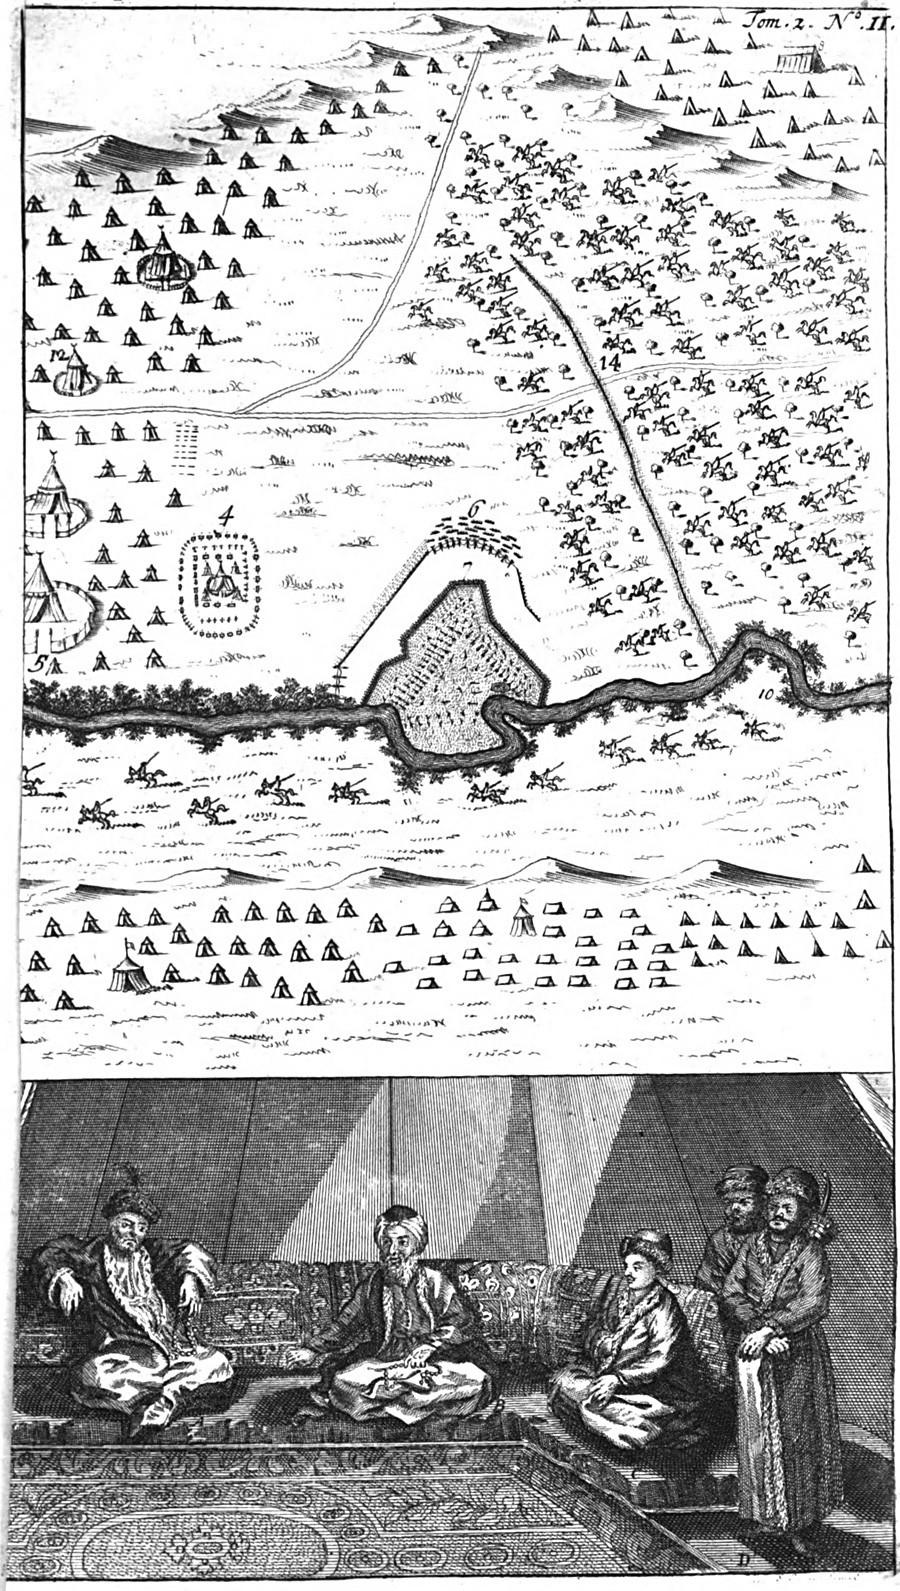 """Bataille du Prout"". Ilustração de William Hogarth (1697-1764) para a ""Viagens"", de Aubry de la Motraye, 1724."